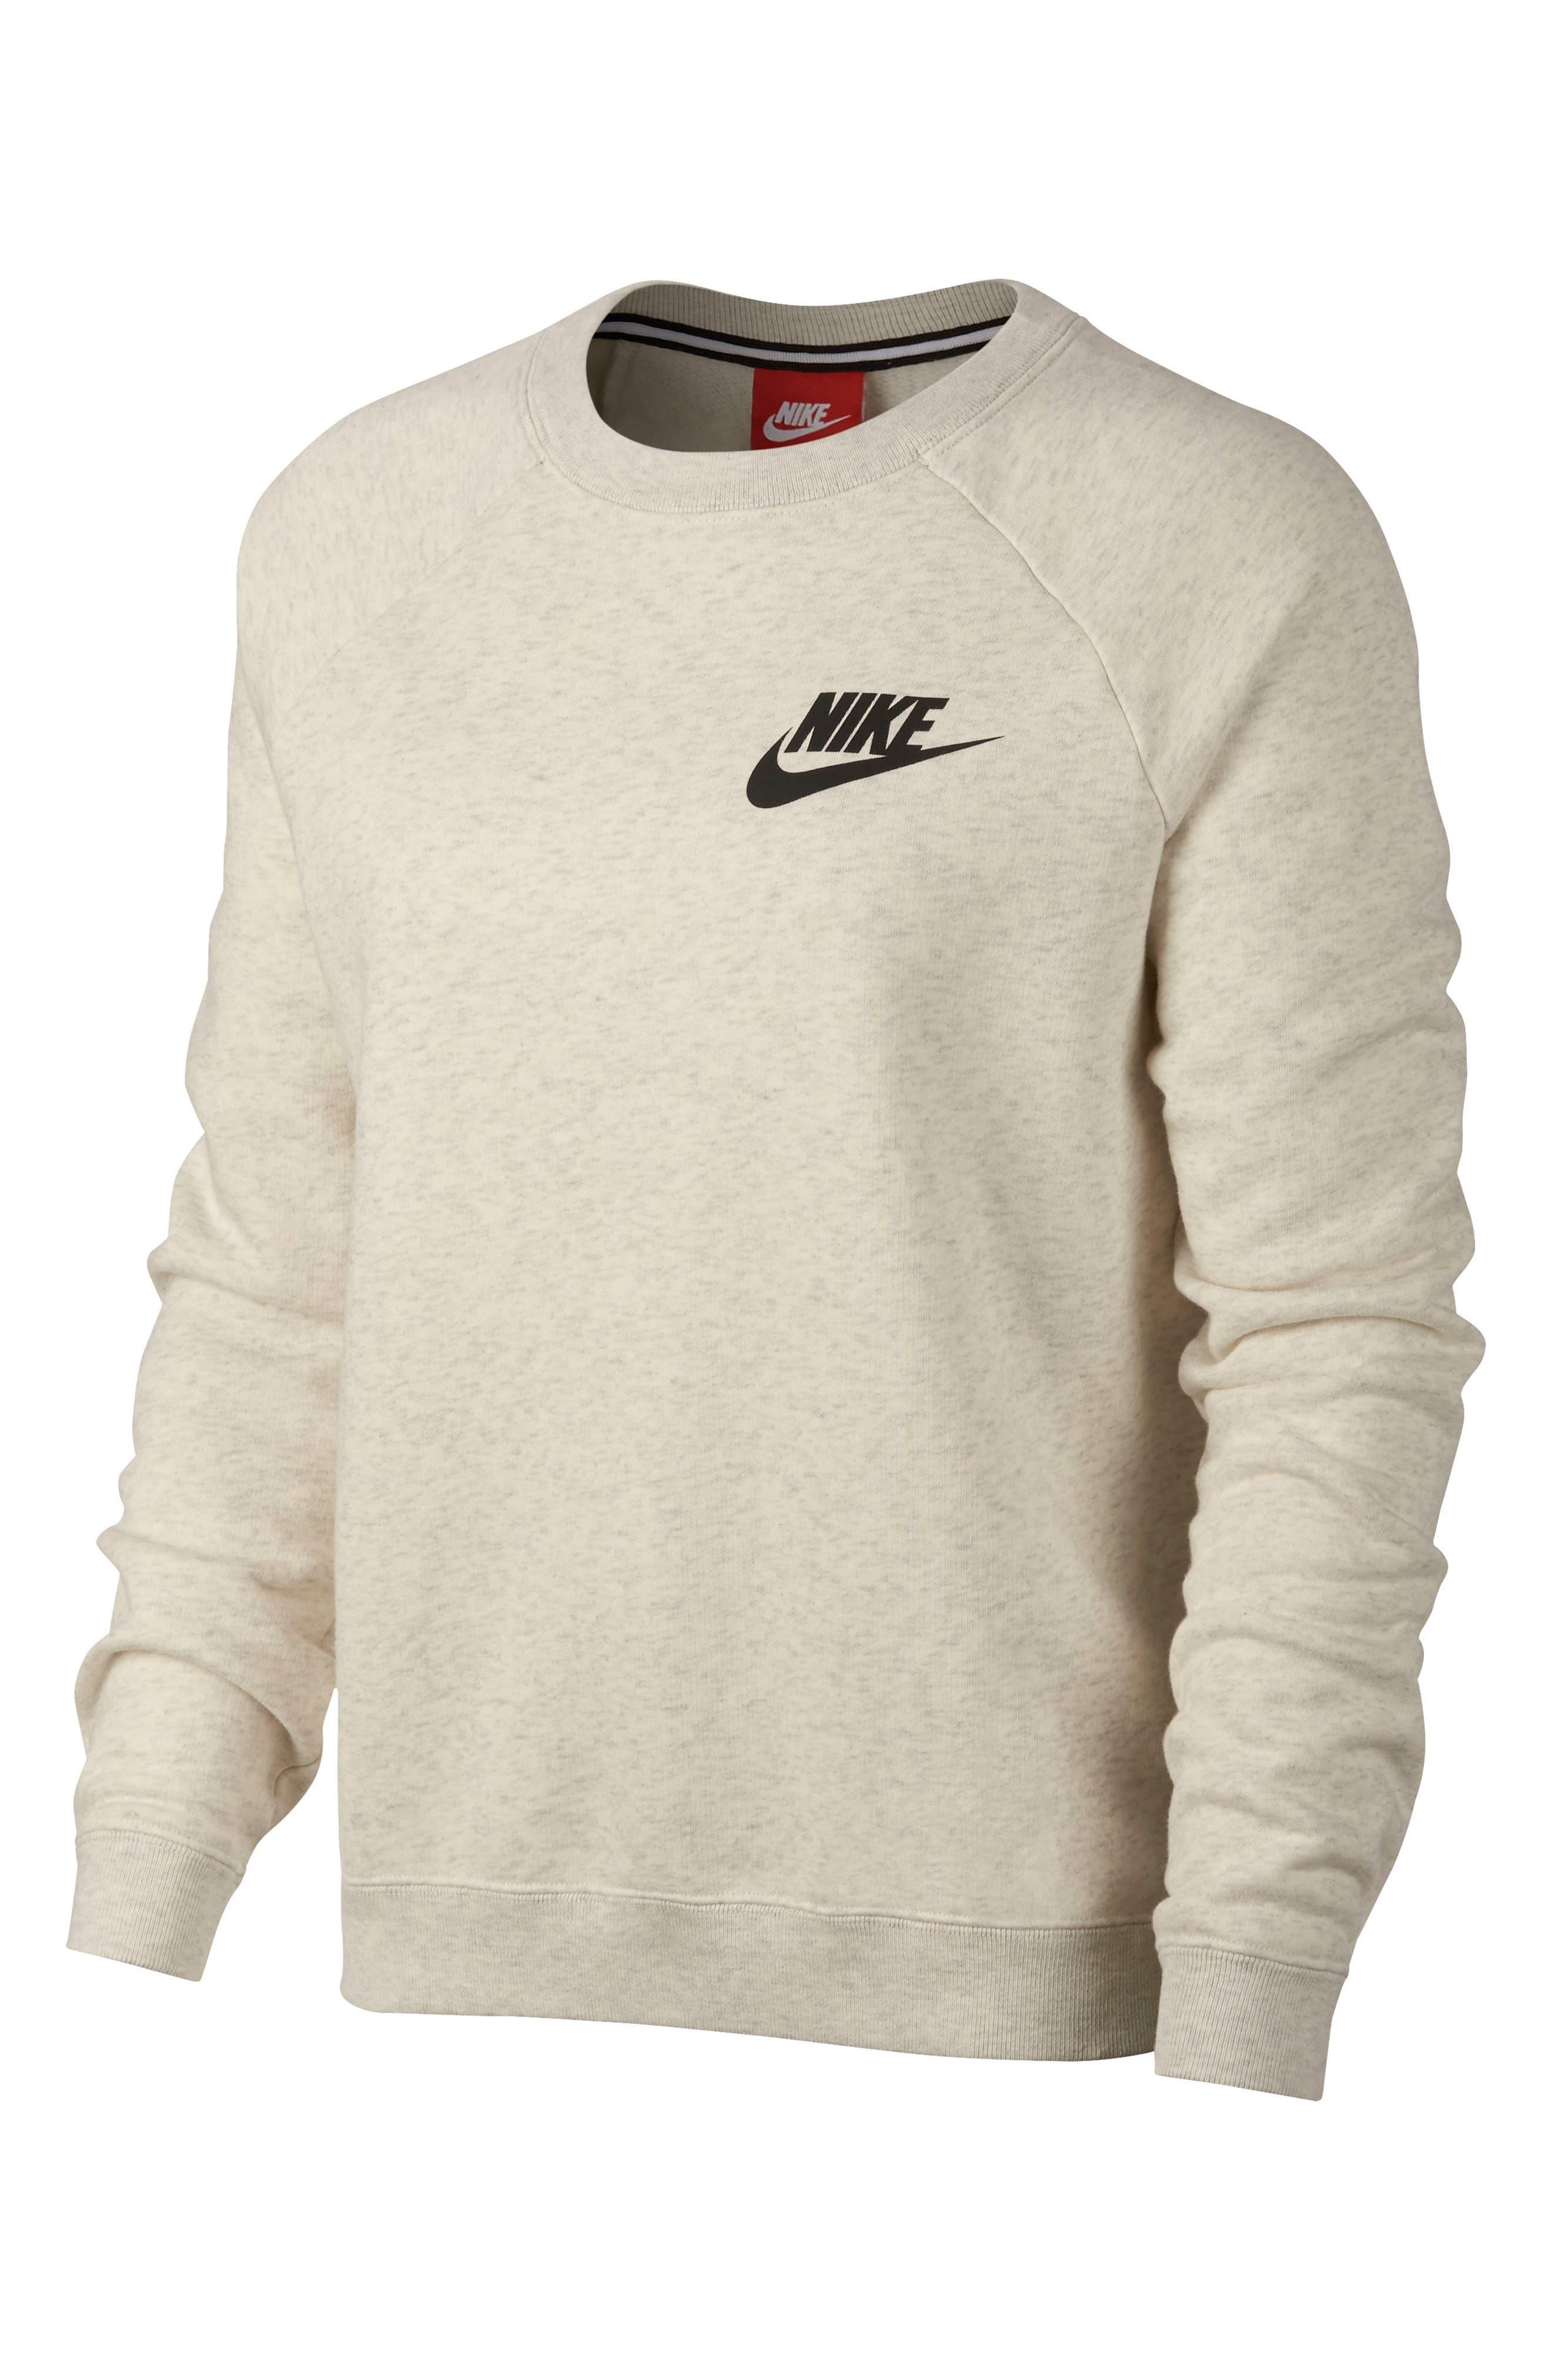 Sportswear Rally Sweatshirt,                             Main thumbnail 1, color,                             250